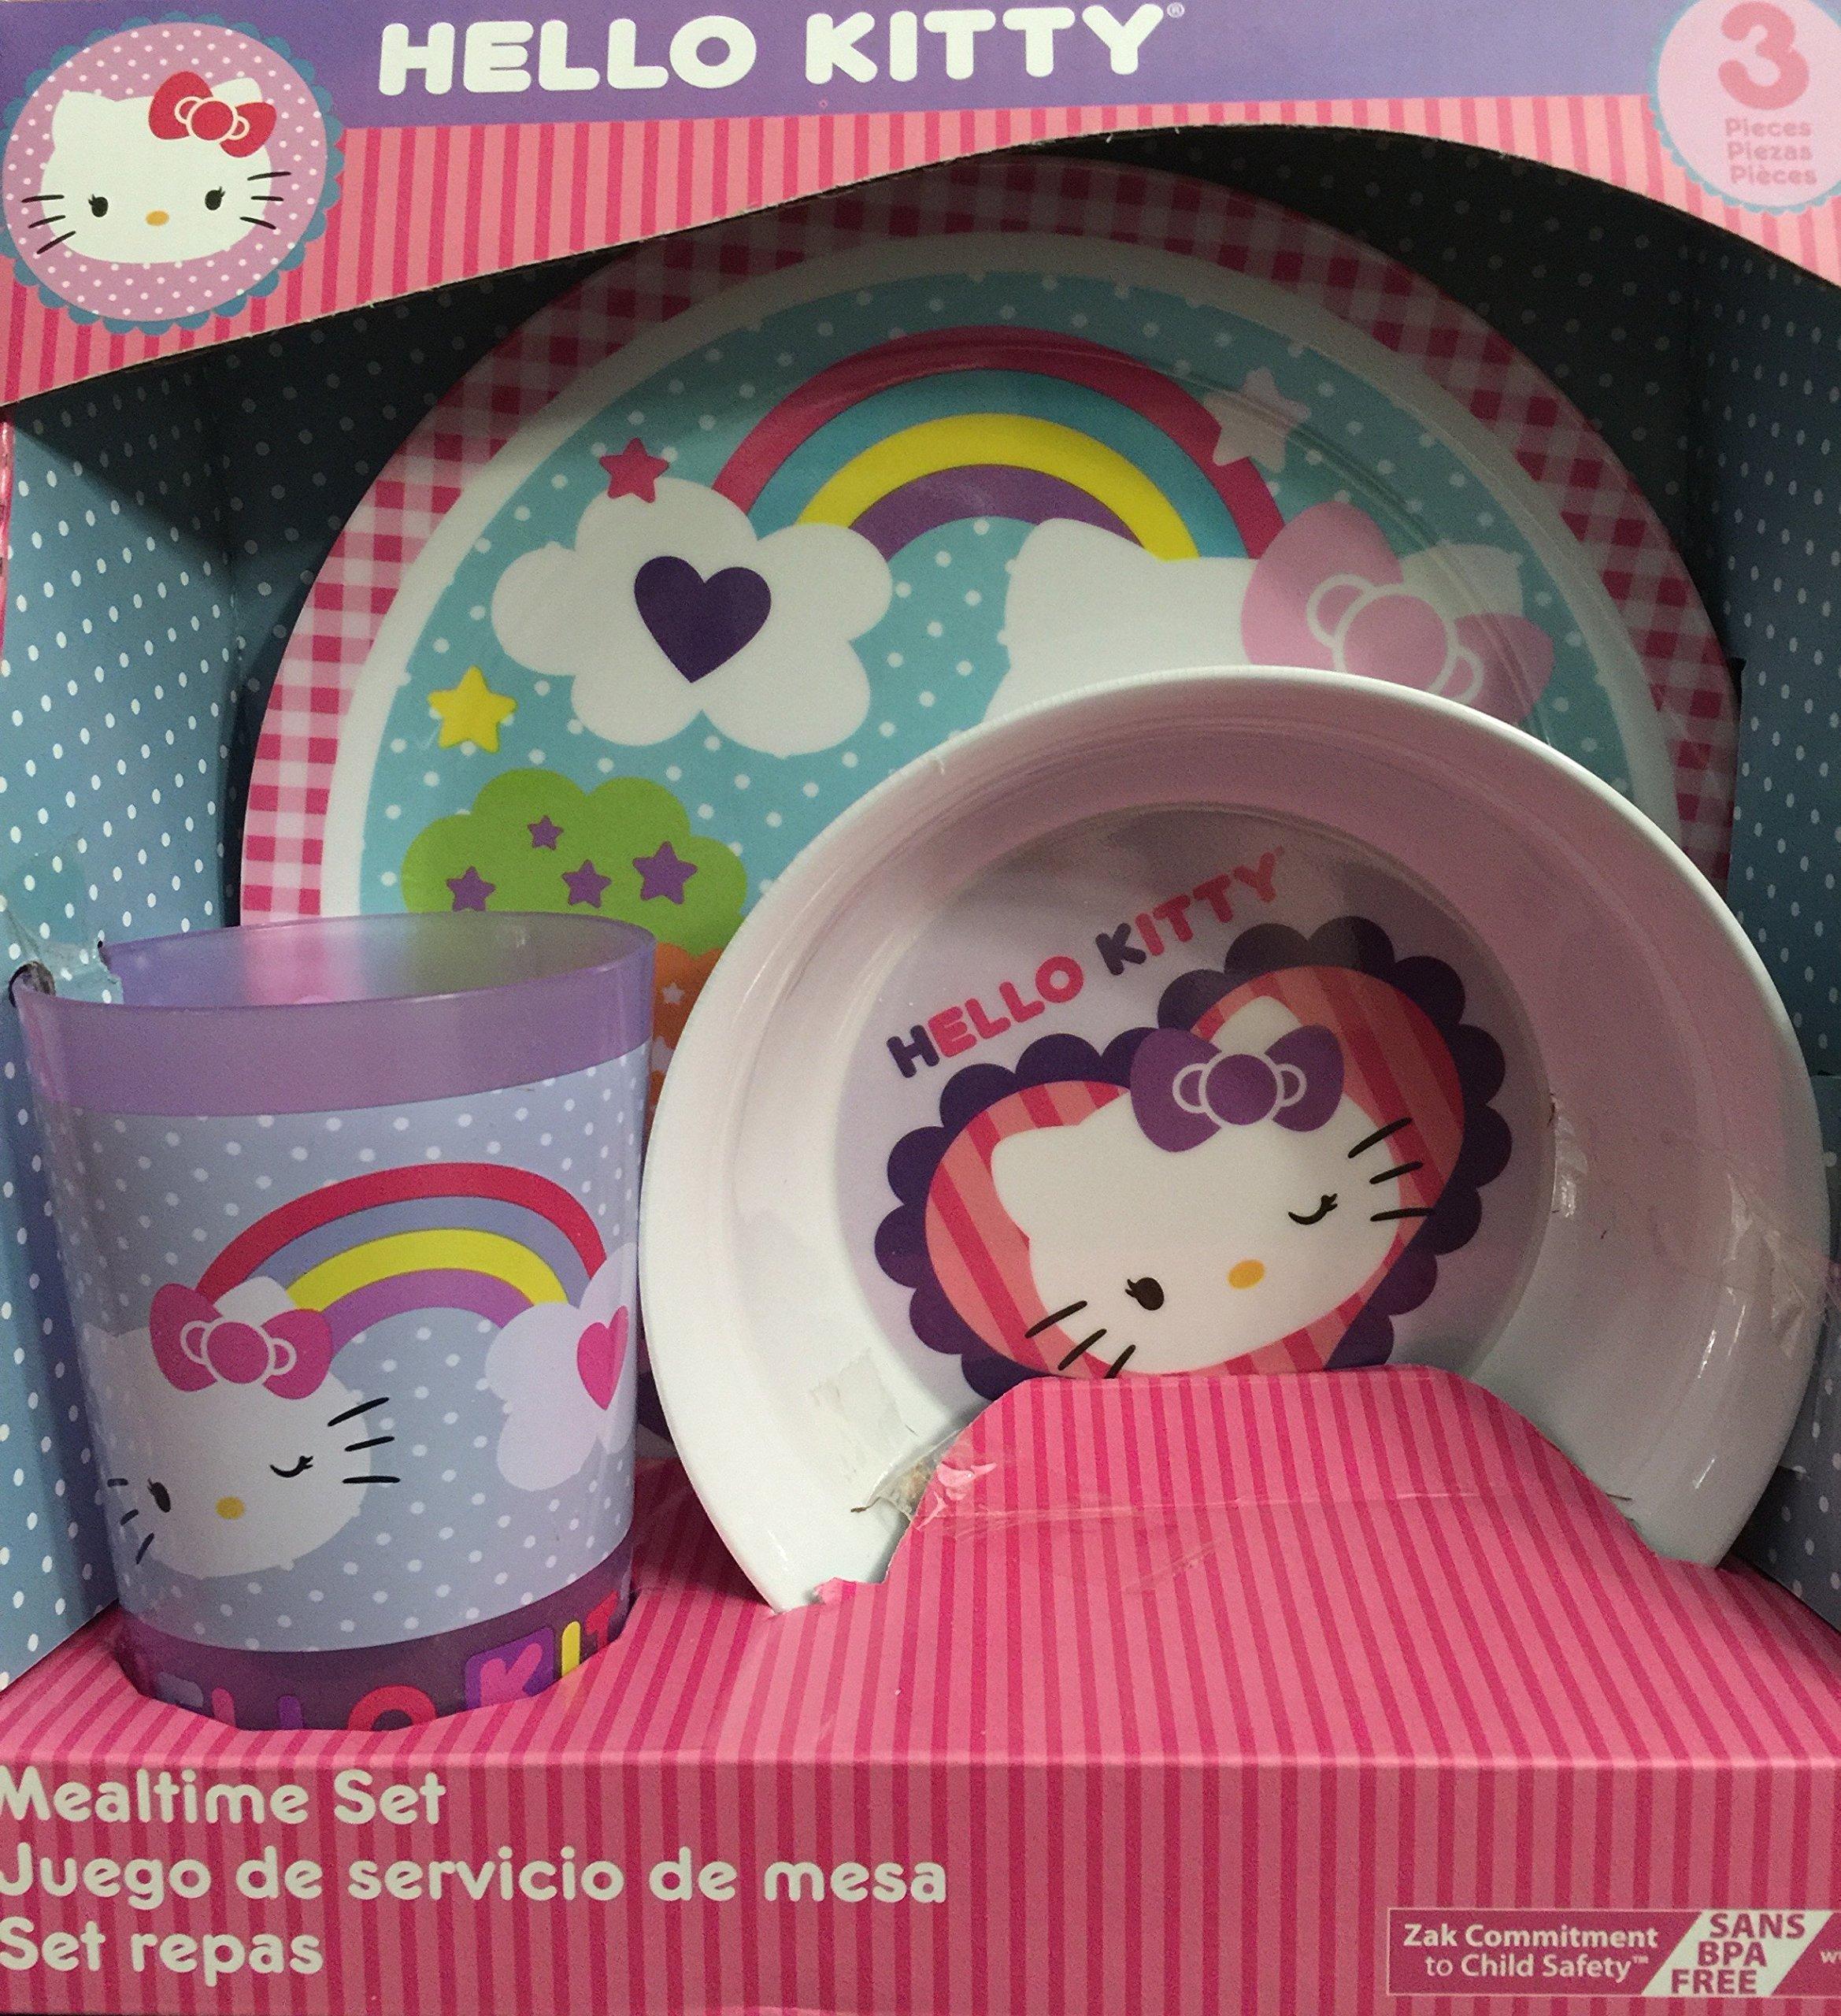 Hello Kitty 3 Piece Mealtime Set Purple by Zak Designs (Image #1)